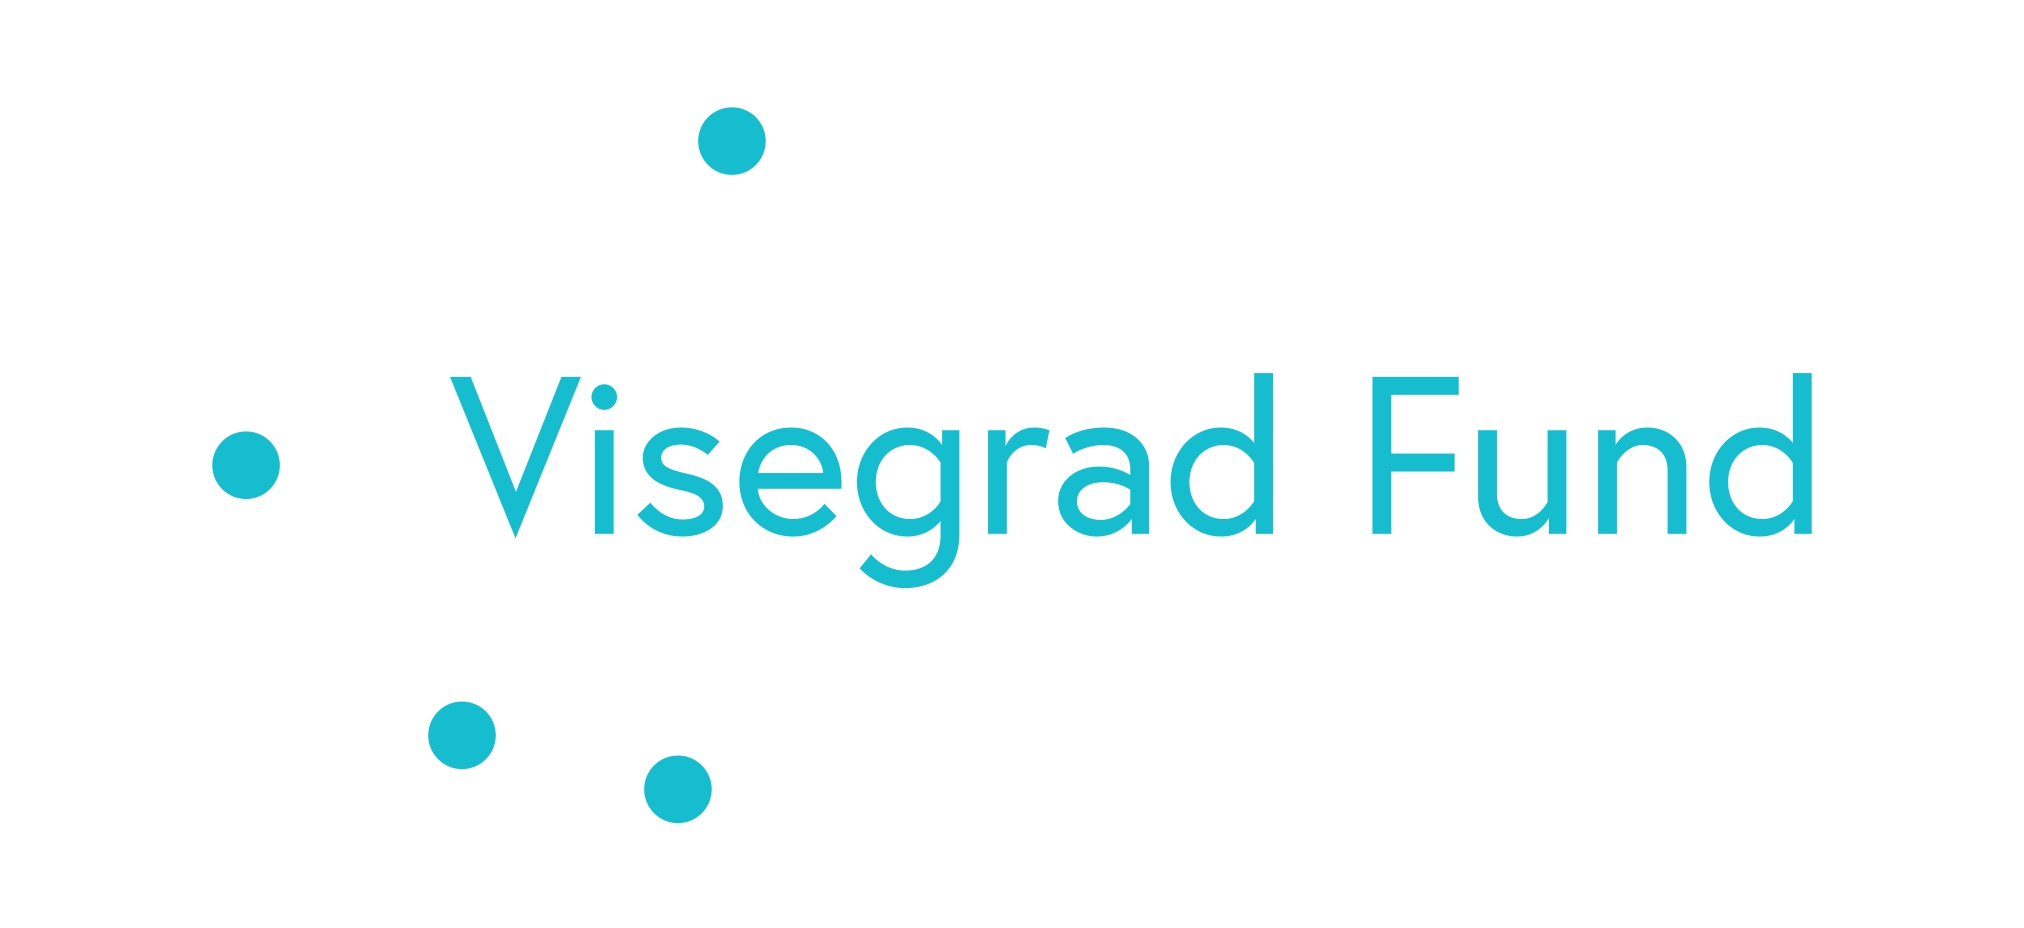 visegrad_fund_logo_blue_page-0001.jpg